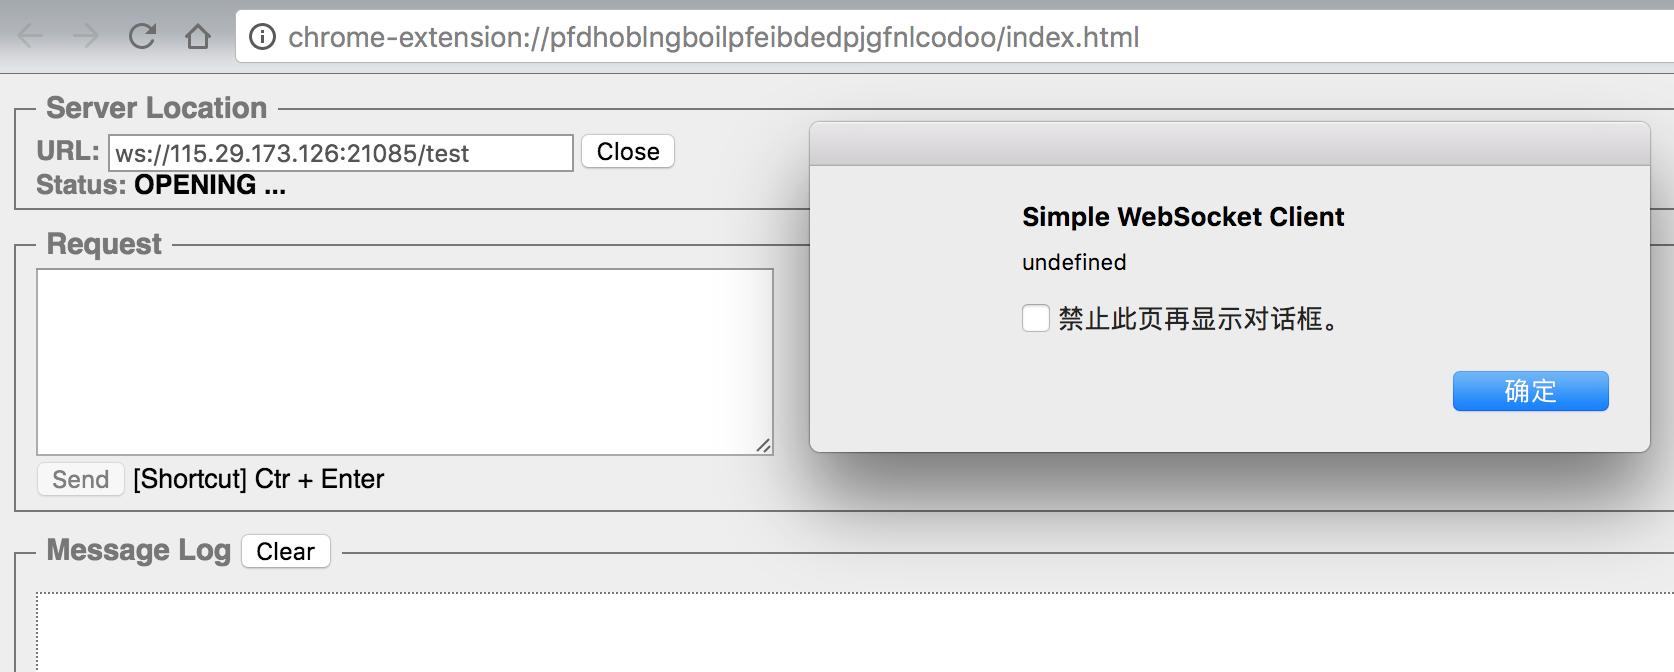 【未解决】Simple WebSocket Client测试Flask的websocket显示OPENING且弹出undefined对话框